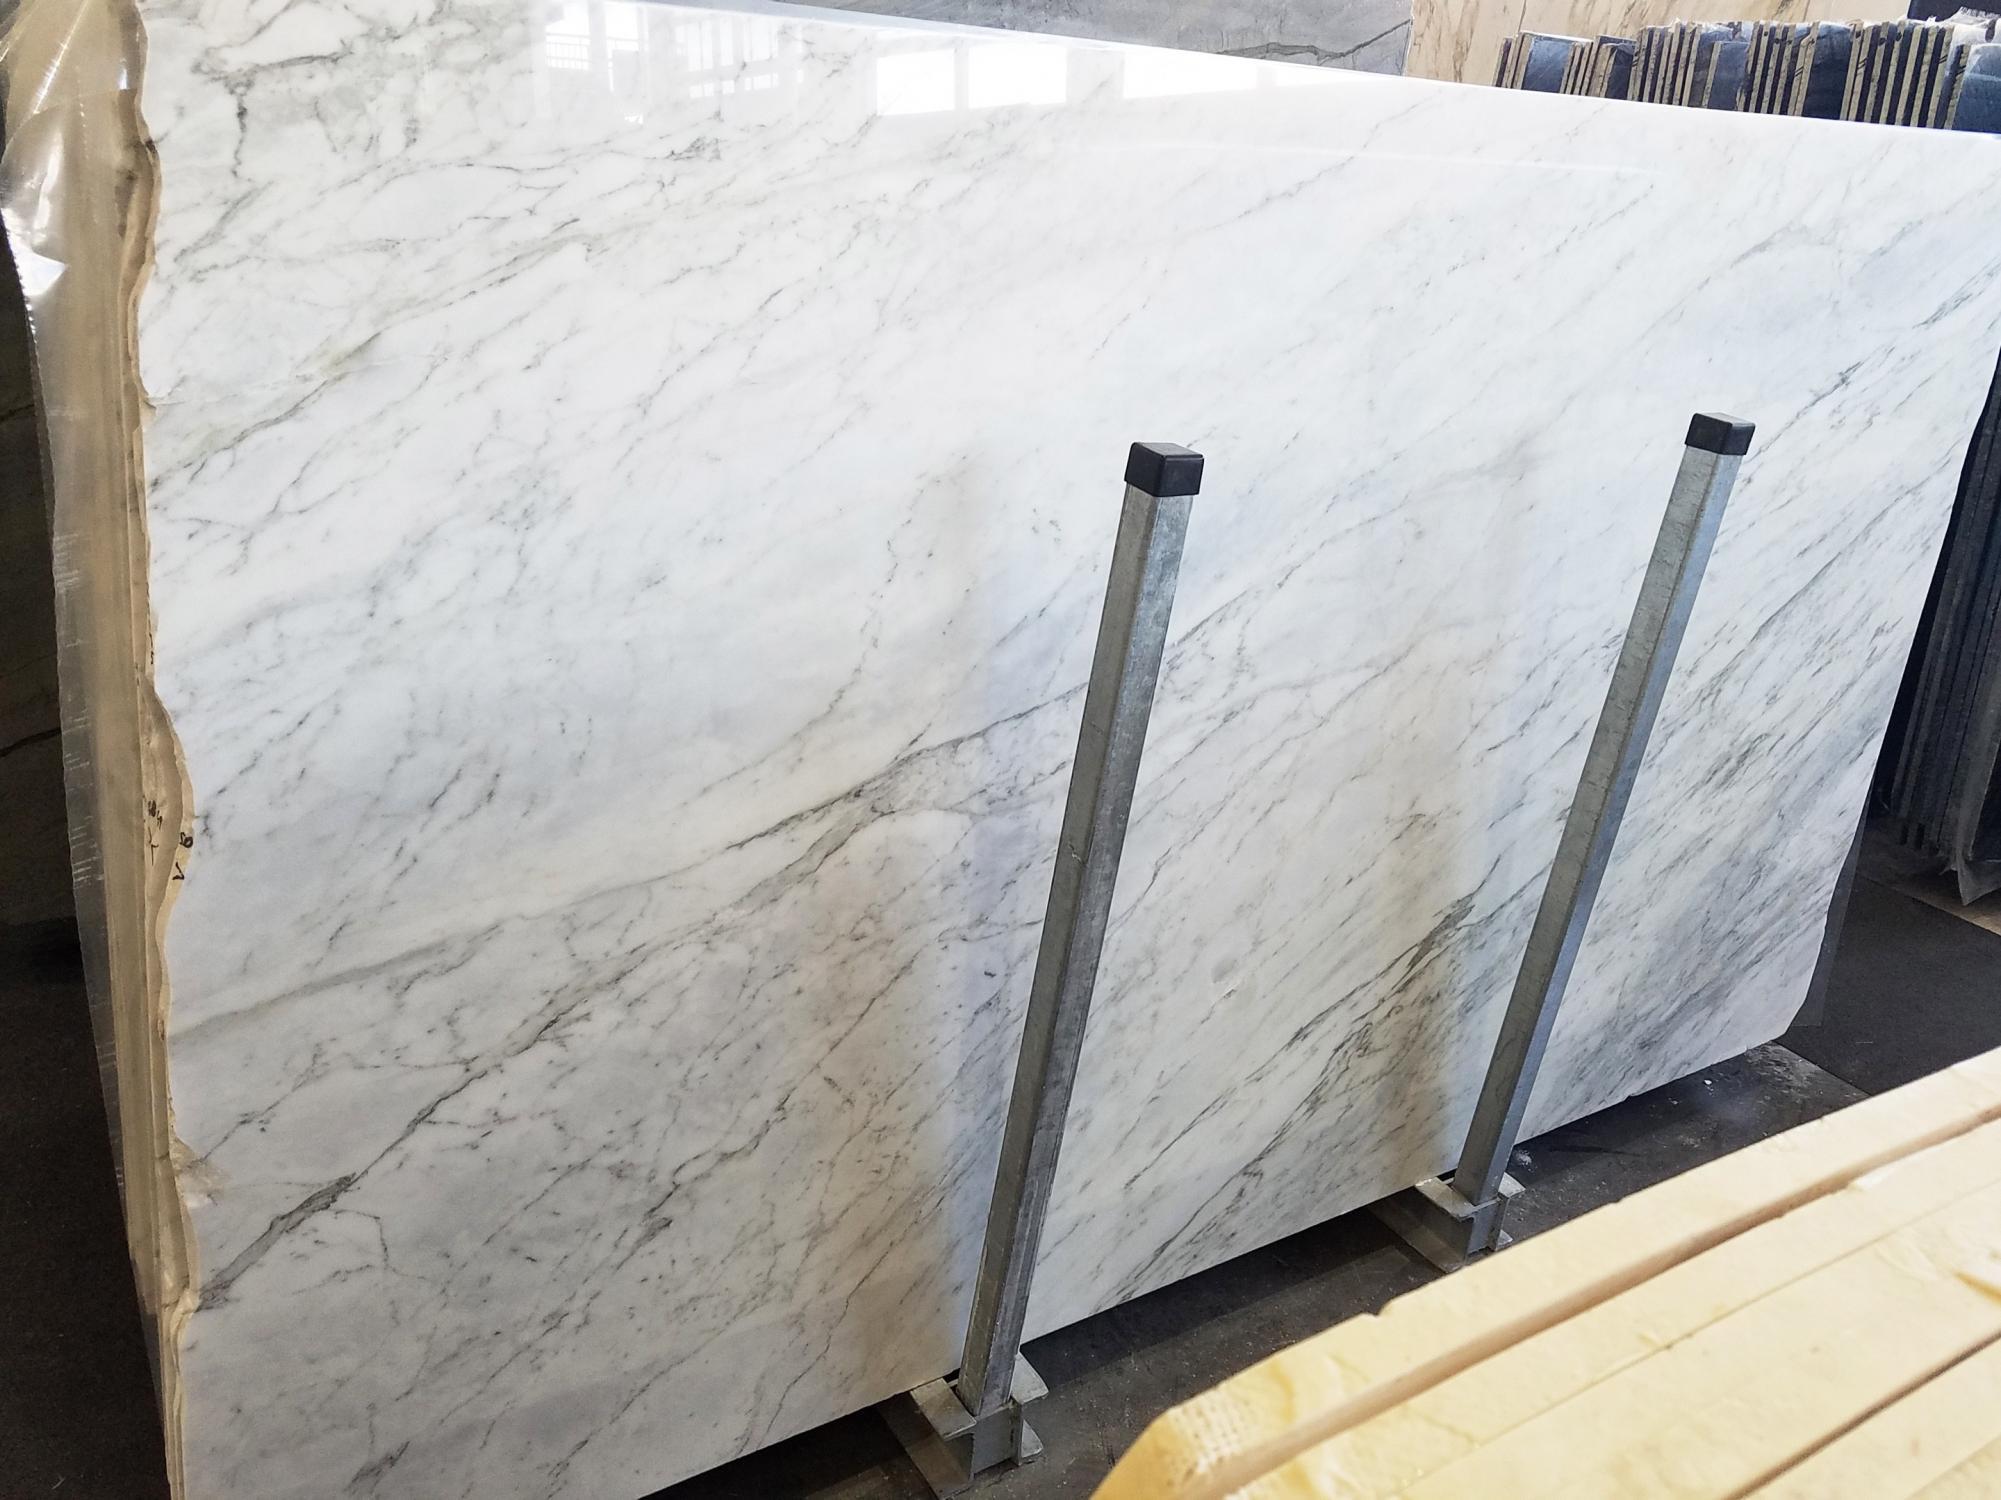 CALACATTA ARNI Suministro Veneto (Italia) de planchas pulidas en mármol natural Z0175 , Slab #41